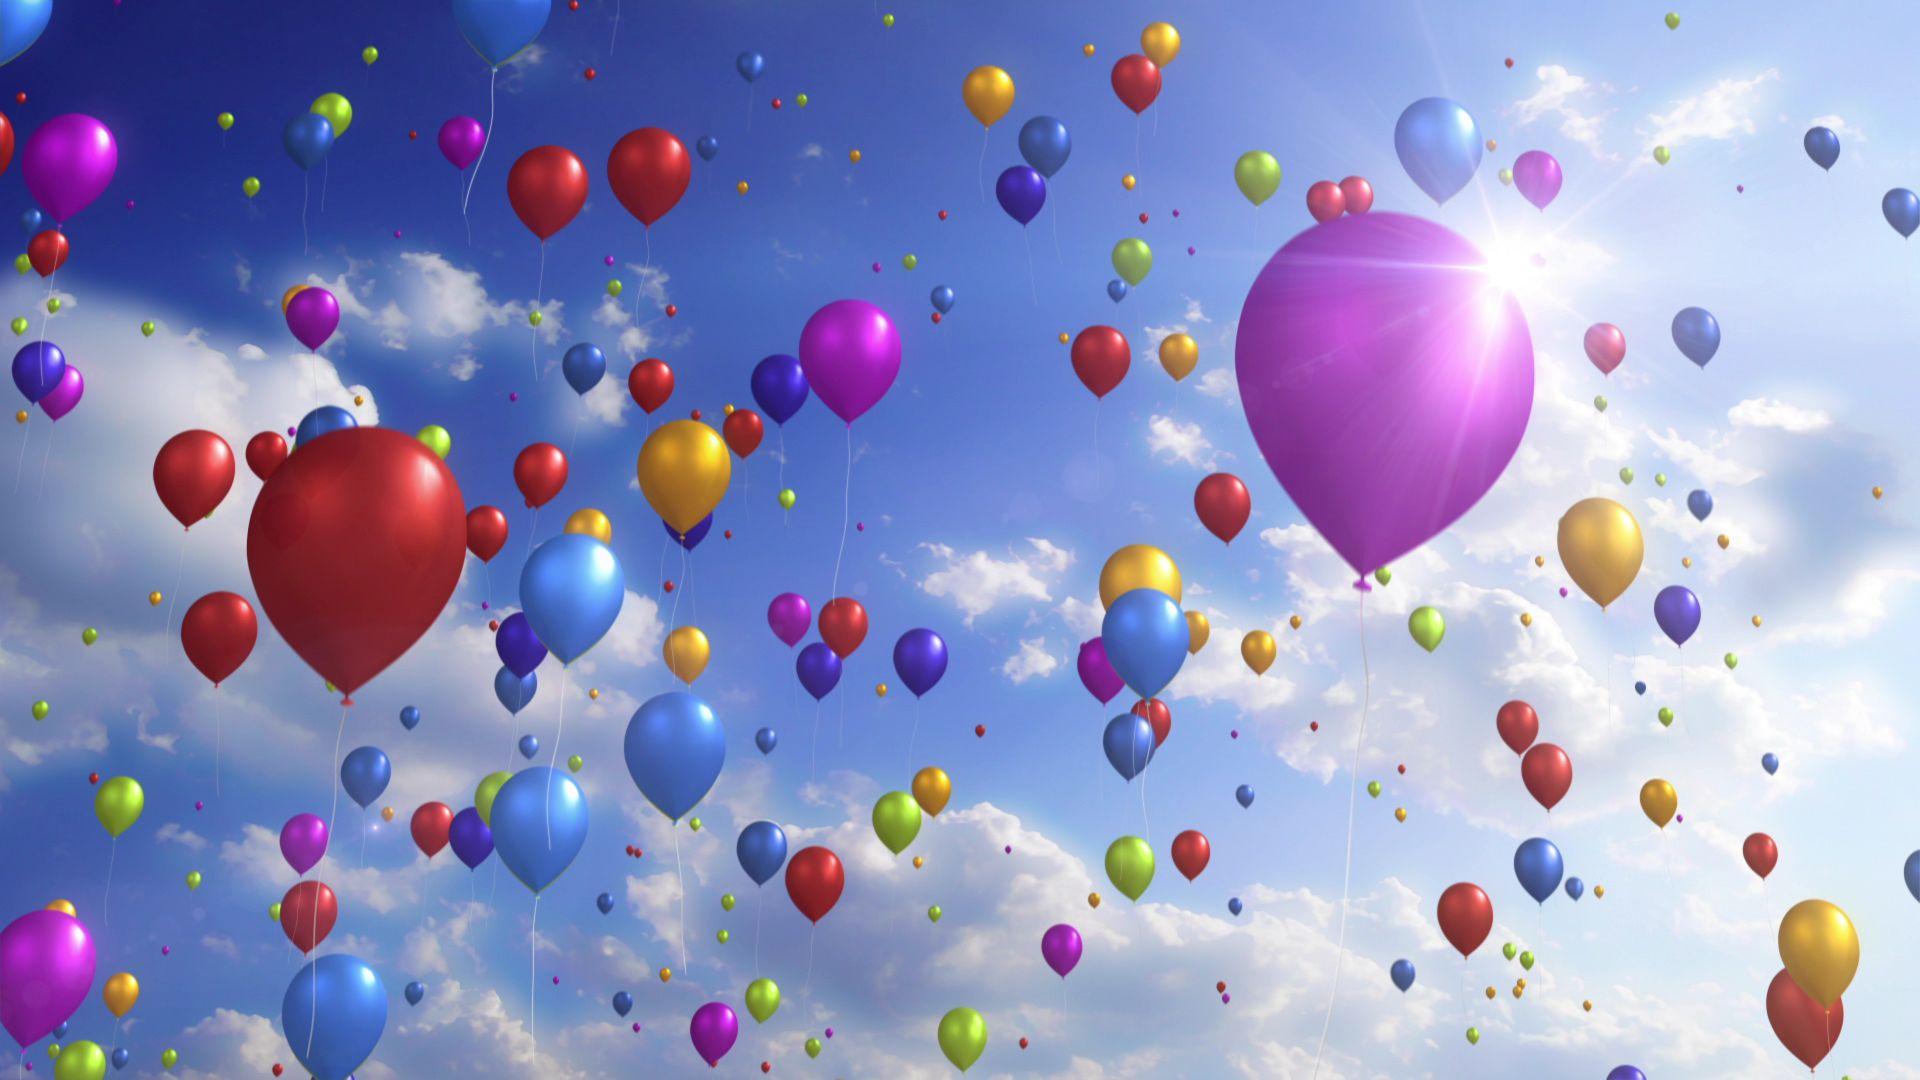 Free photo: Colorful Balloons - Balloons, Birthday ...